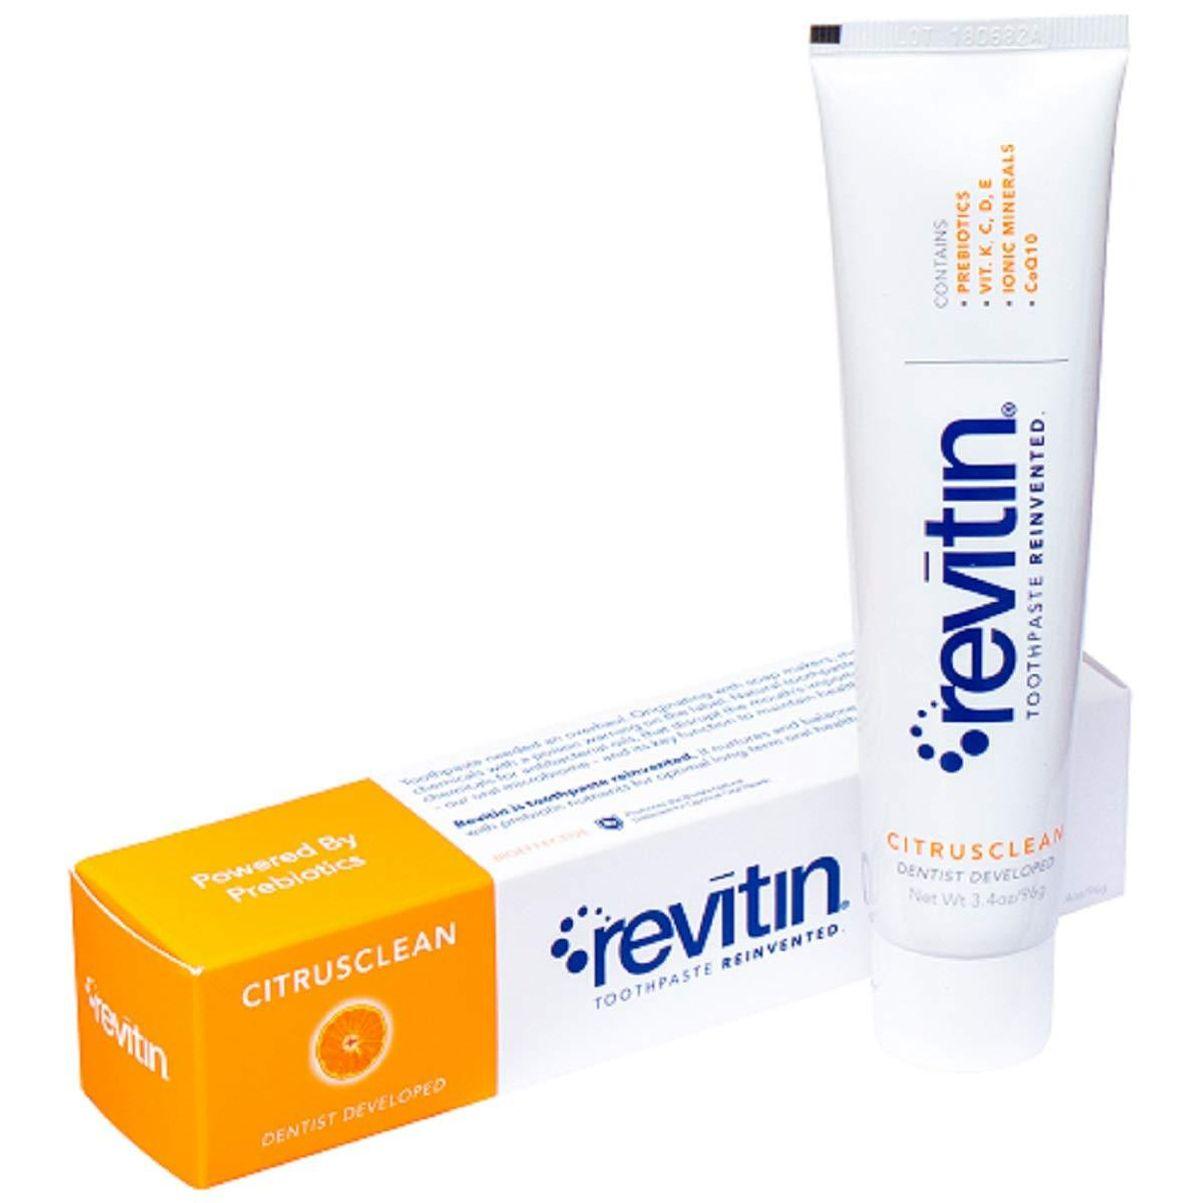 revitin natural prebiotic oral care toothpaste